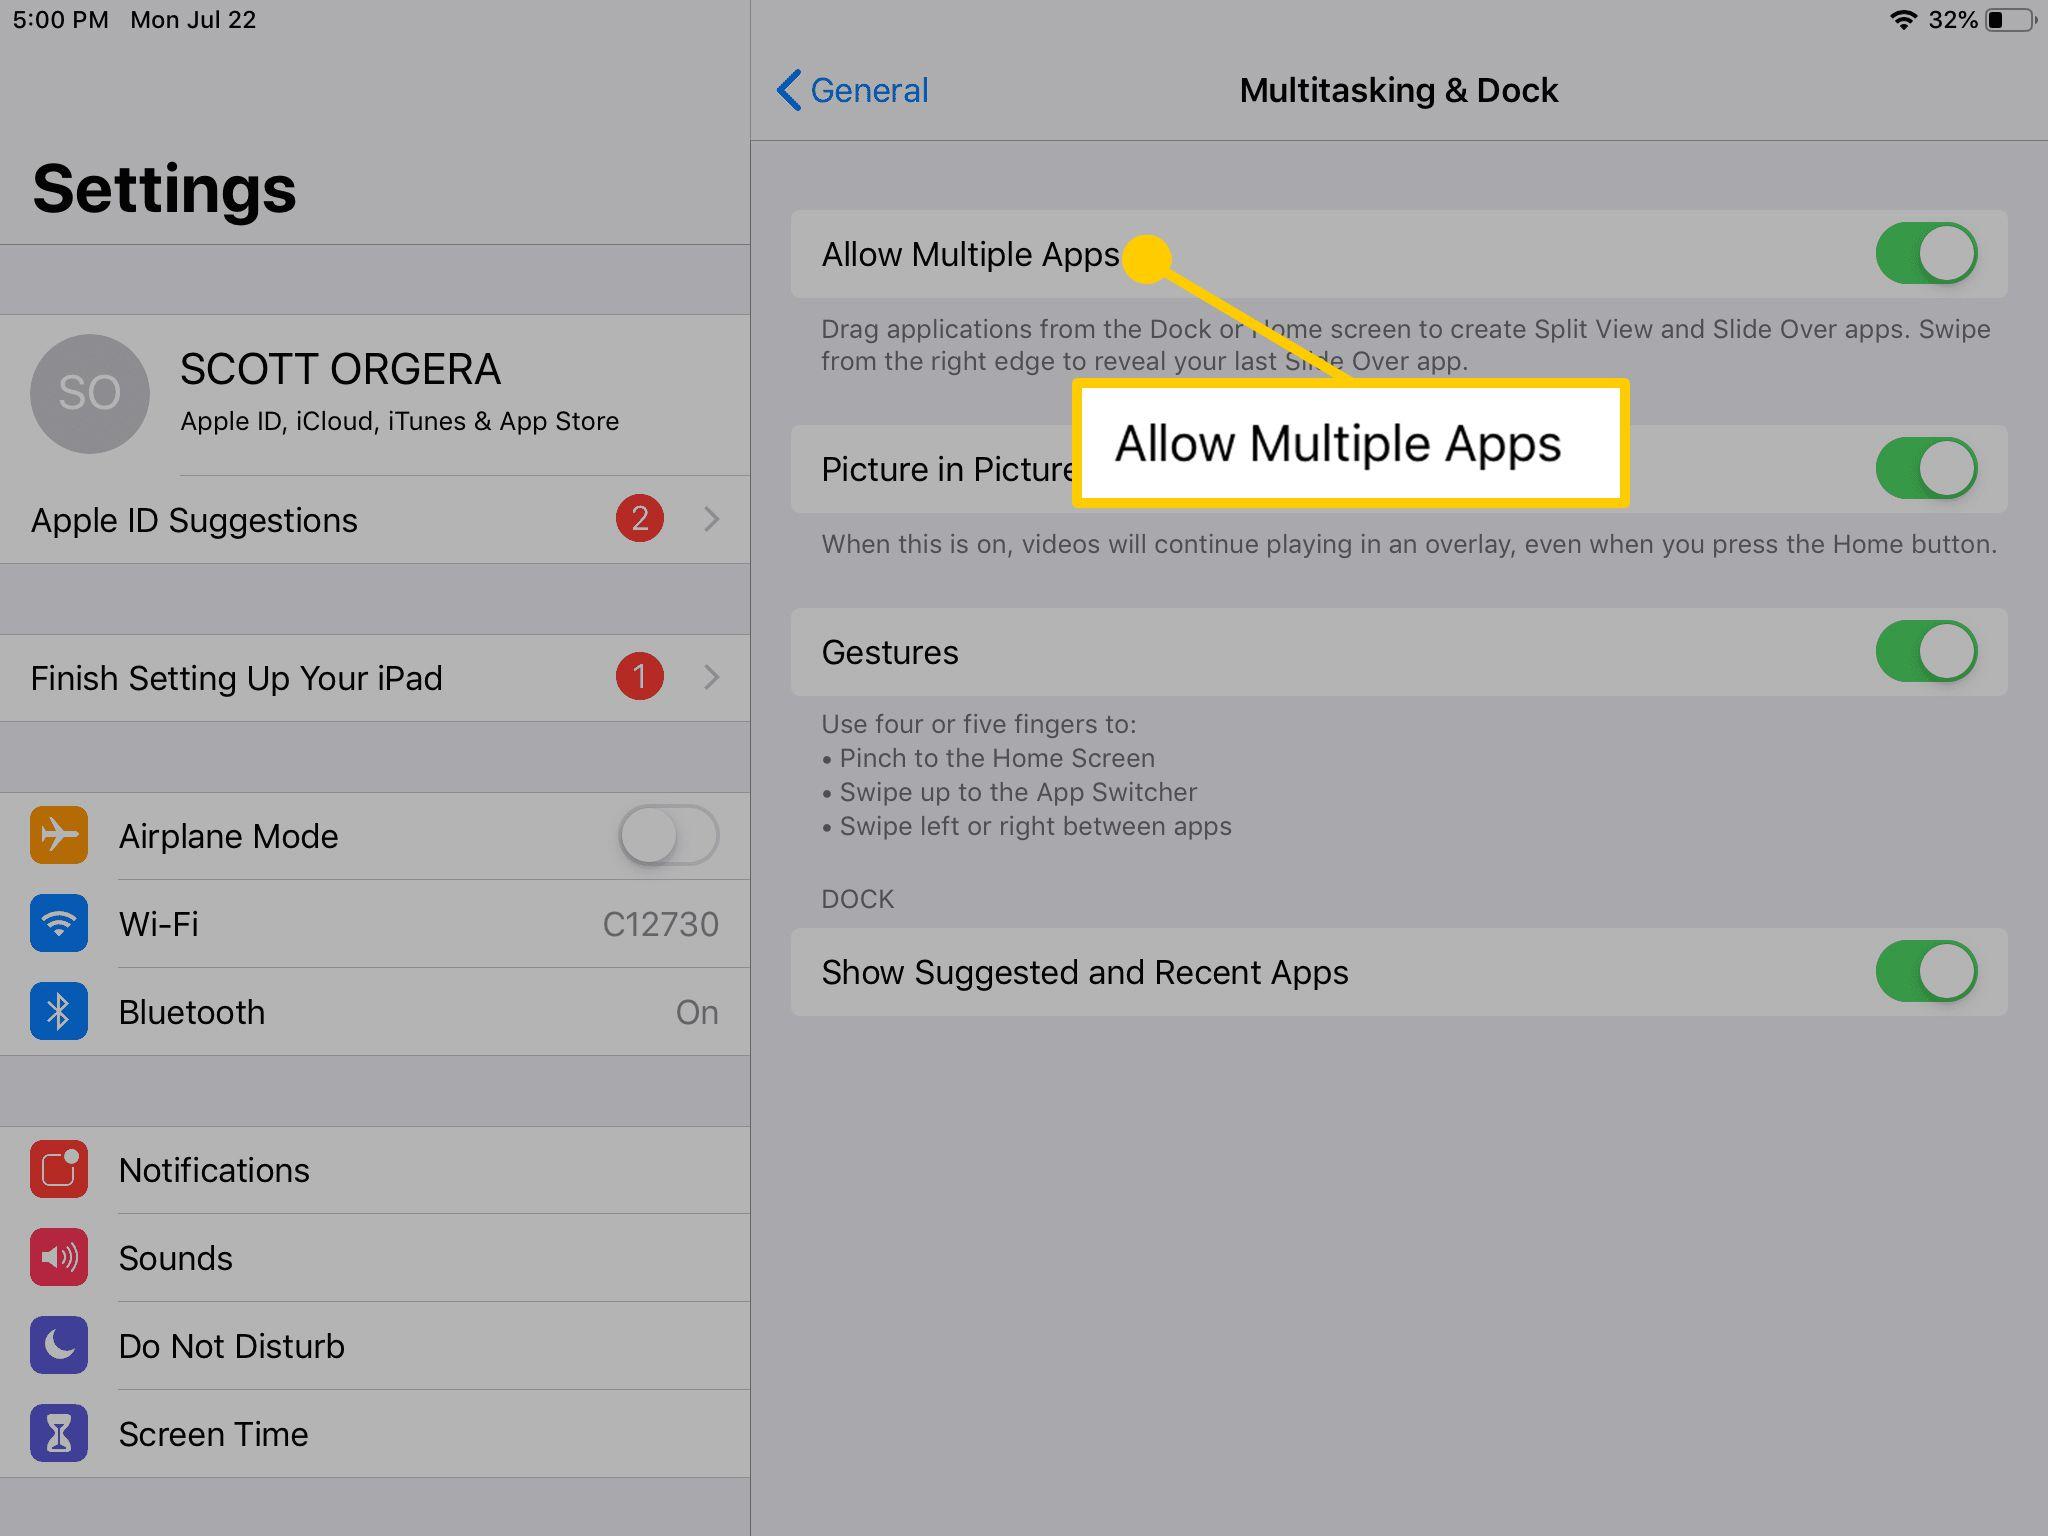 The Allow Multiple Apps in iPad's Multitasking & Dock menu